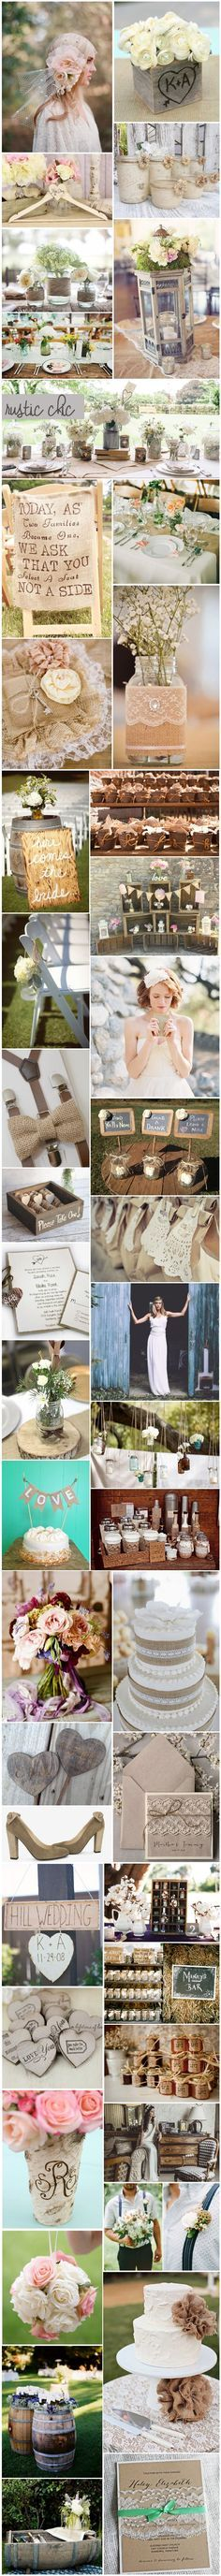 [Inspiration] Mariage rustique chic - gabrieldecor pin it - gabrieldecor.fr - décor mariage gabrieldecor - décoration florale gabrieldecor - pinterest - paris - Facebook - gabrieldecor Nathalie - #gabrieldecor